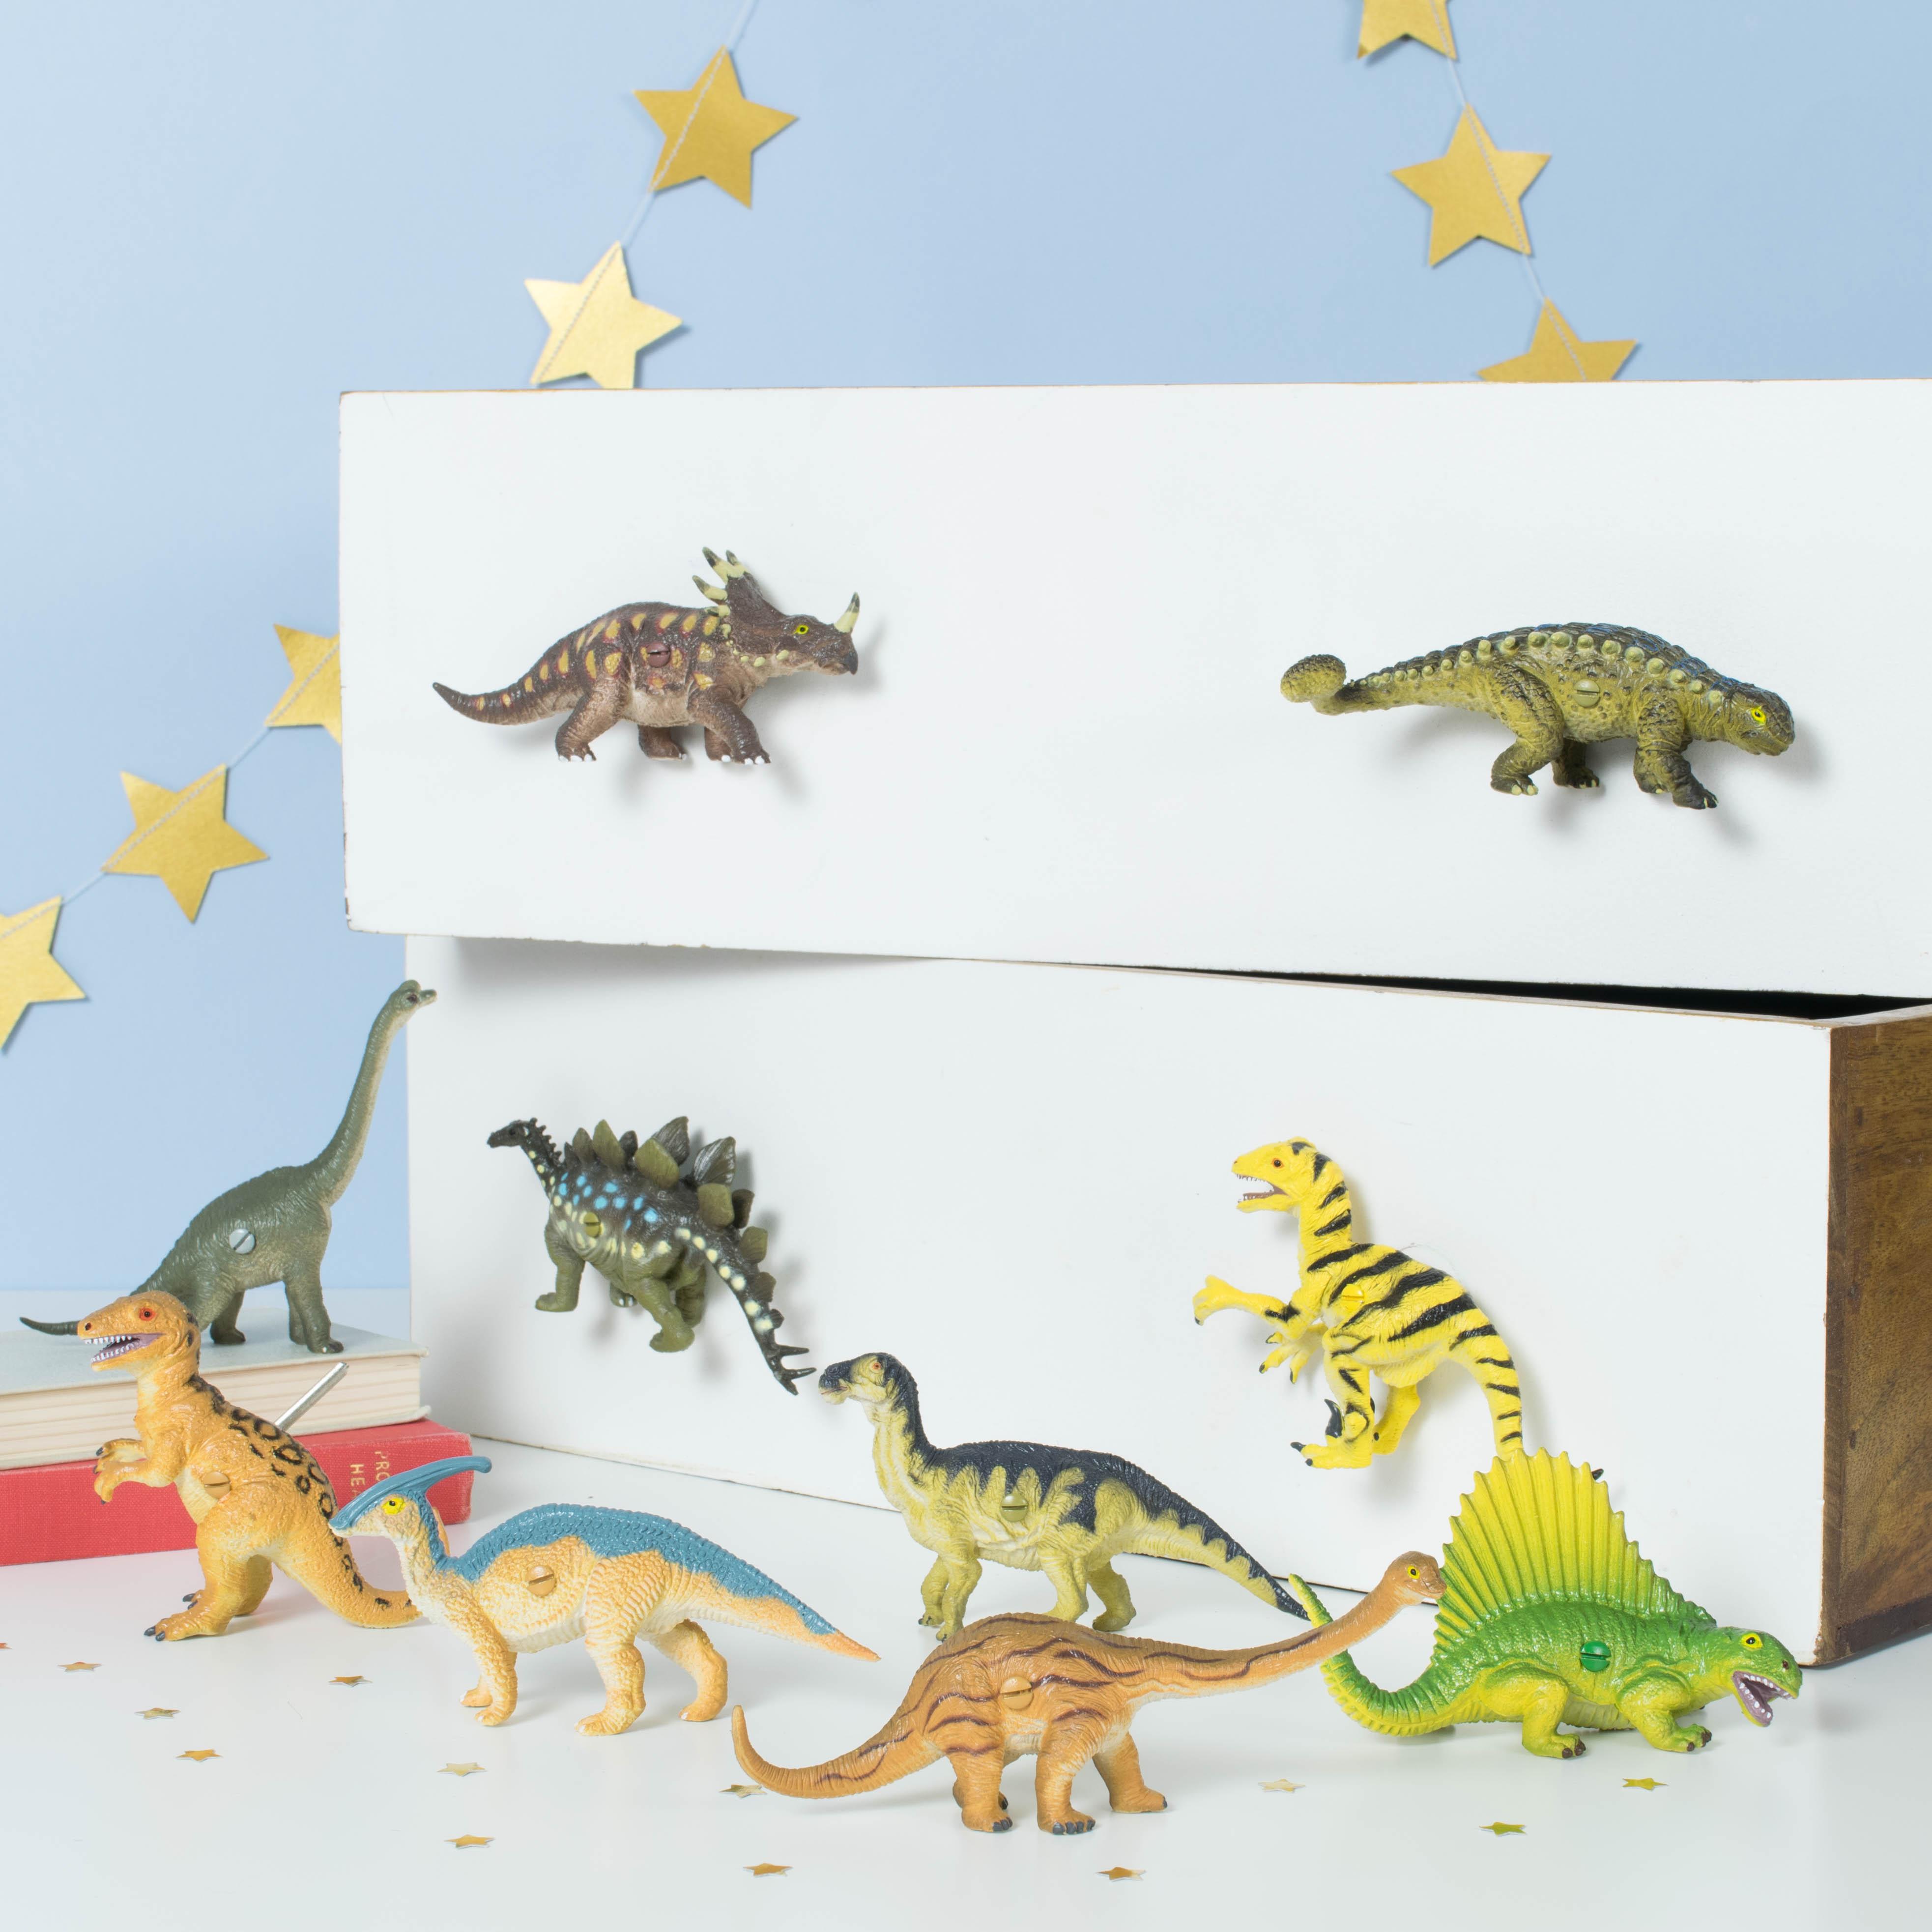 Dinosaur Bedroom The Candy Queen Designs Blog